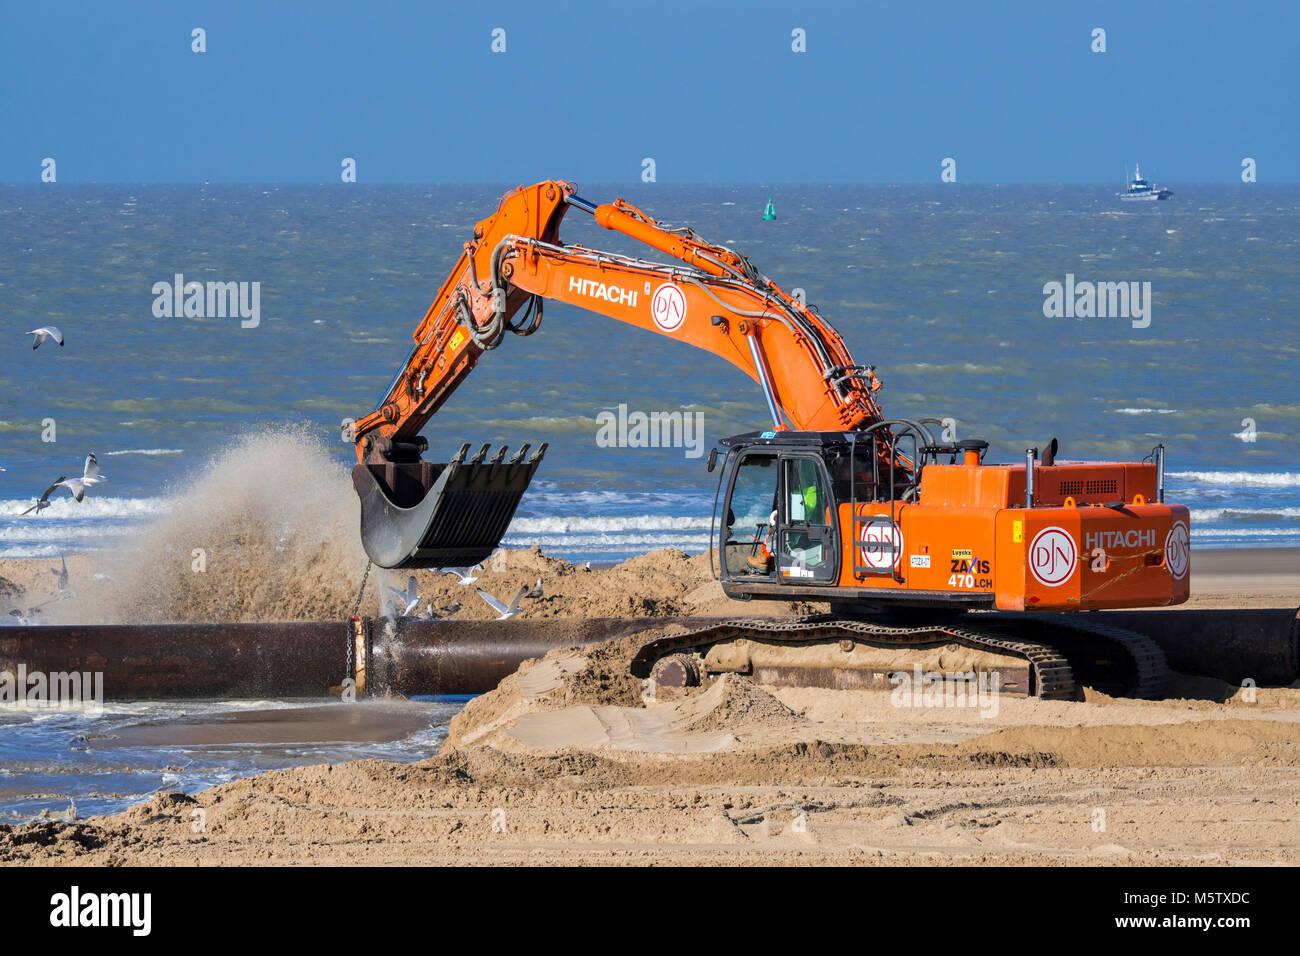 Hydraulikbagger Verbindungsleitungen der Pipeline Während sand Auffüllen/Strand Nahrung arbeitet an der Stockbild